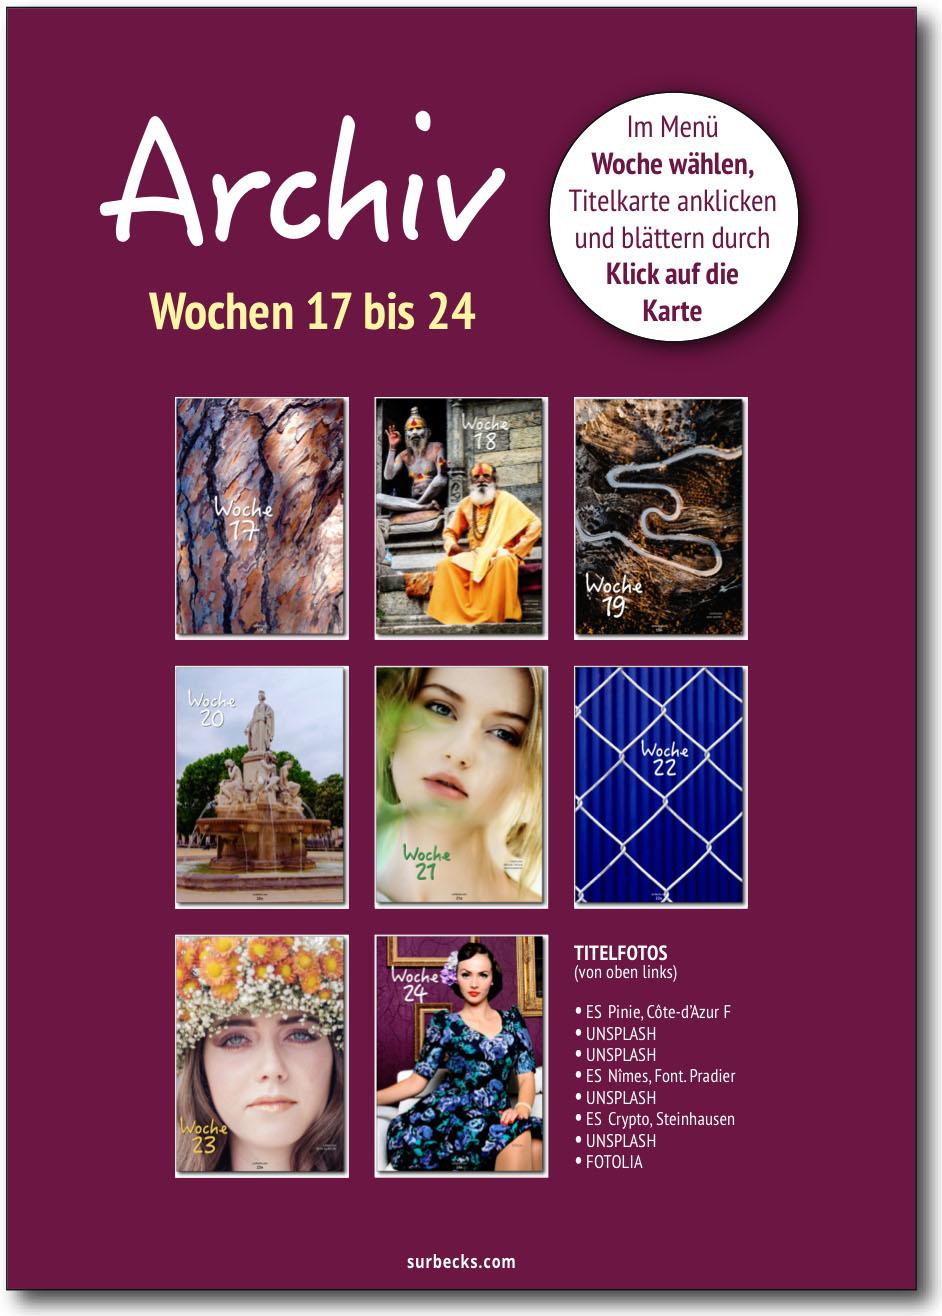 Arch_17-24